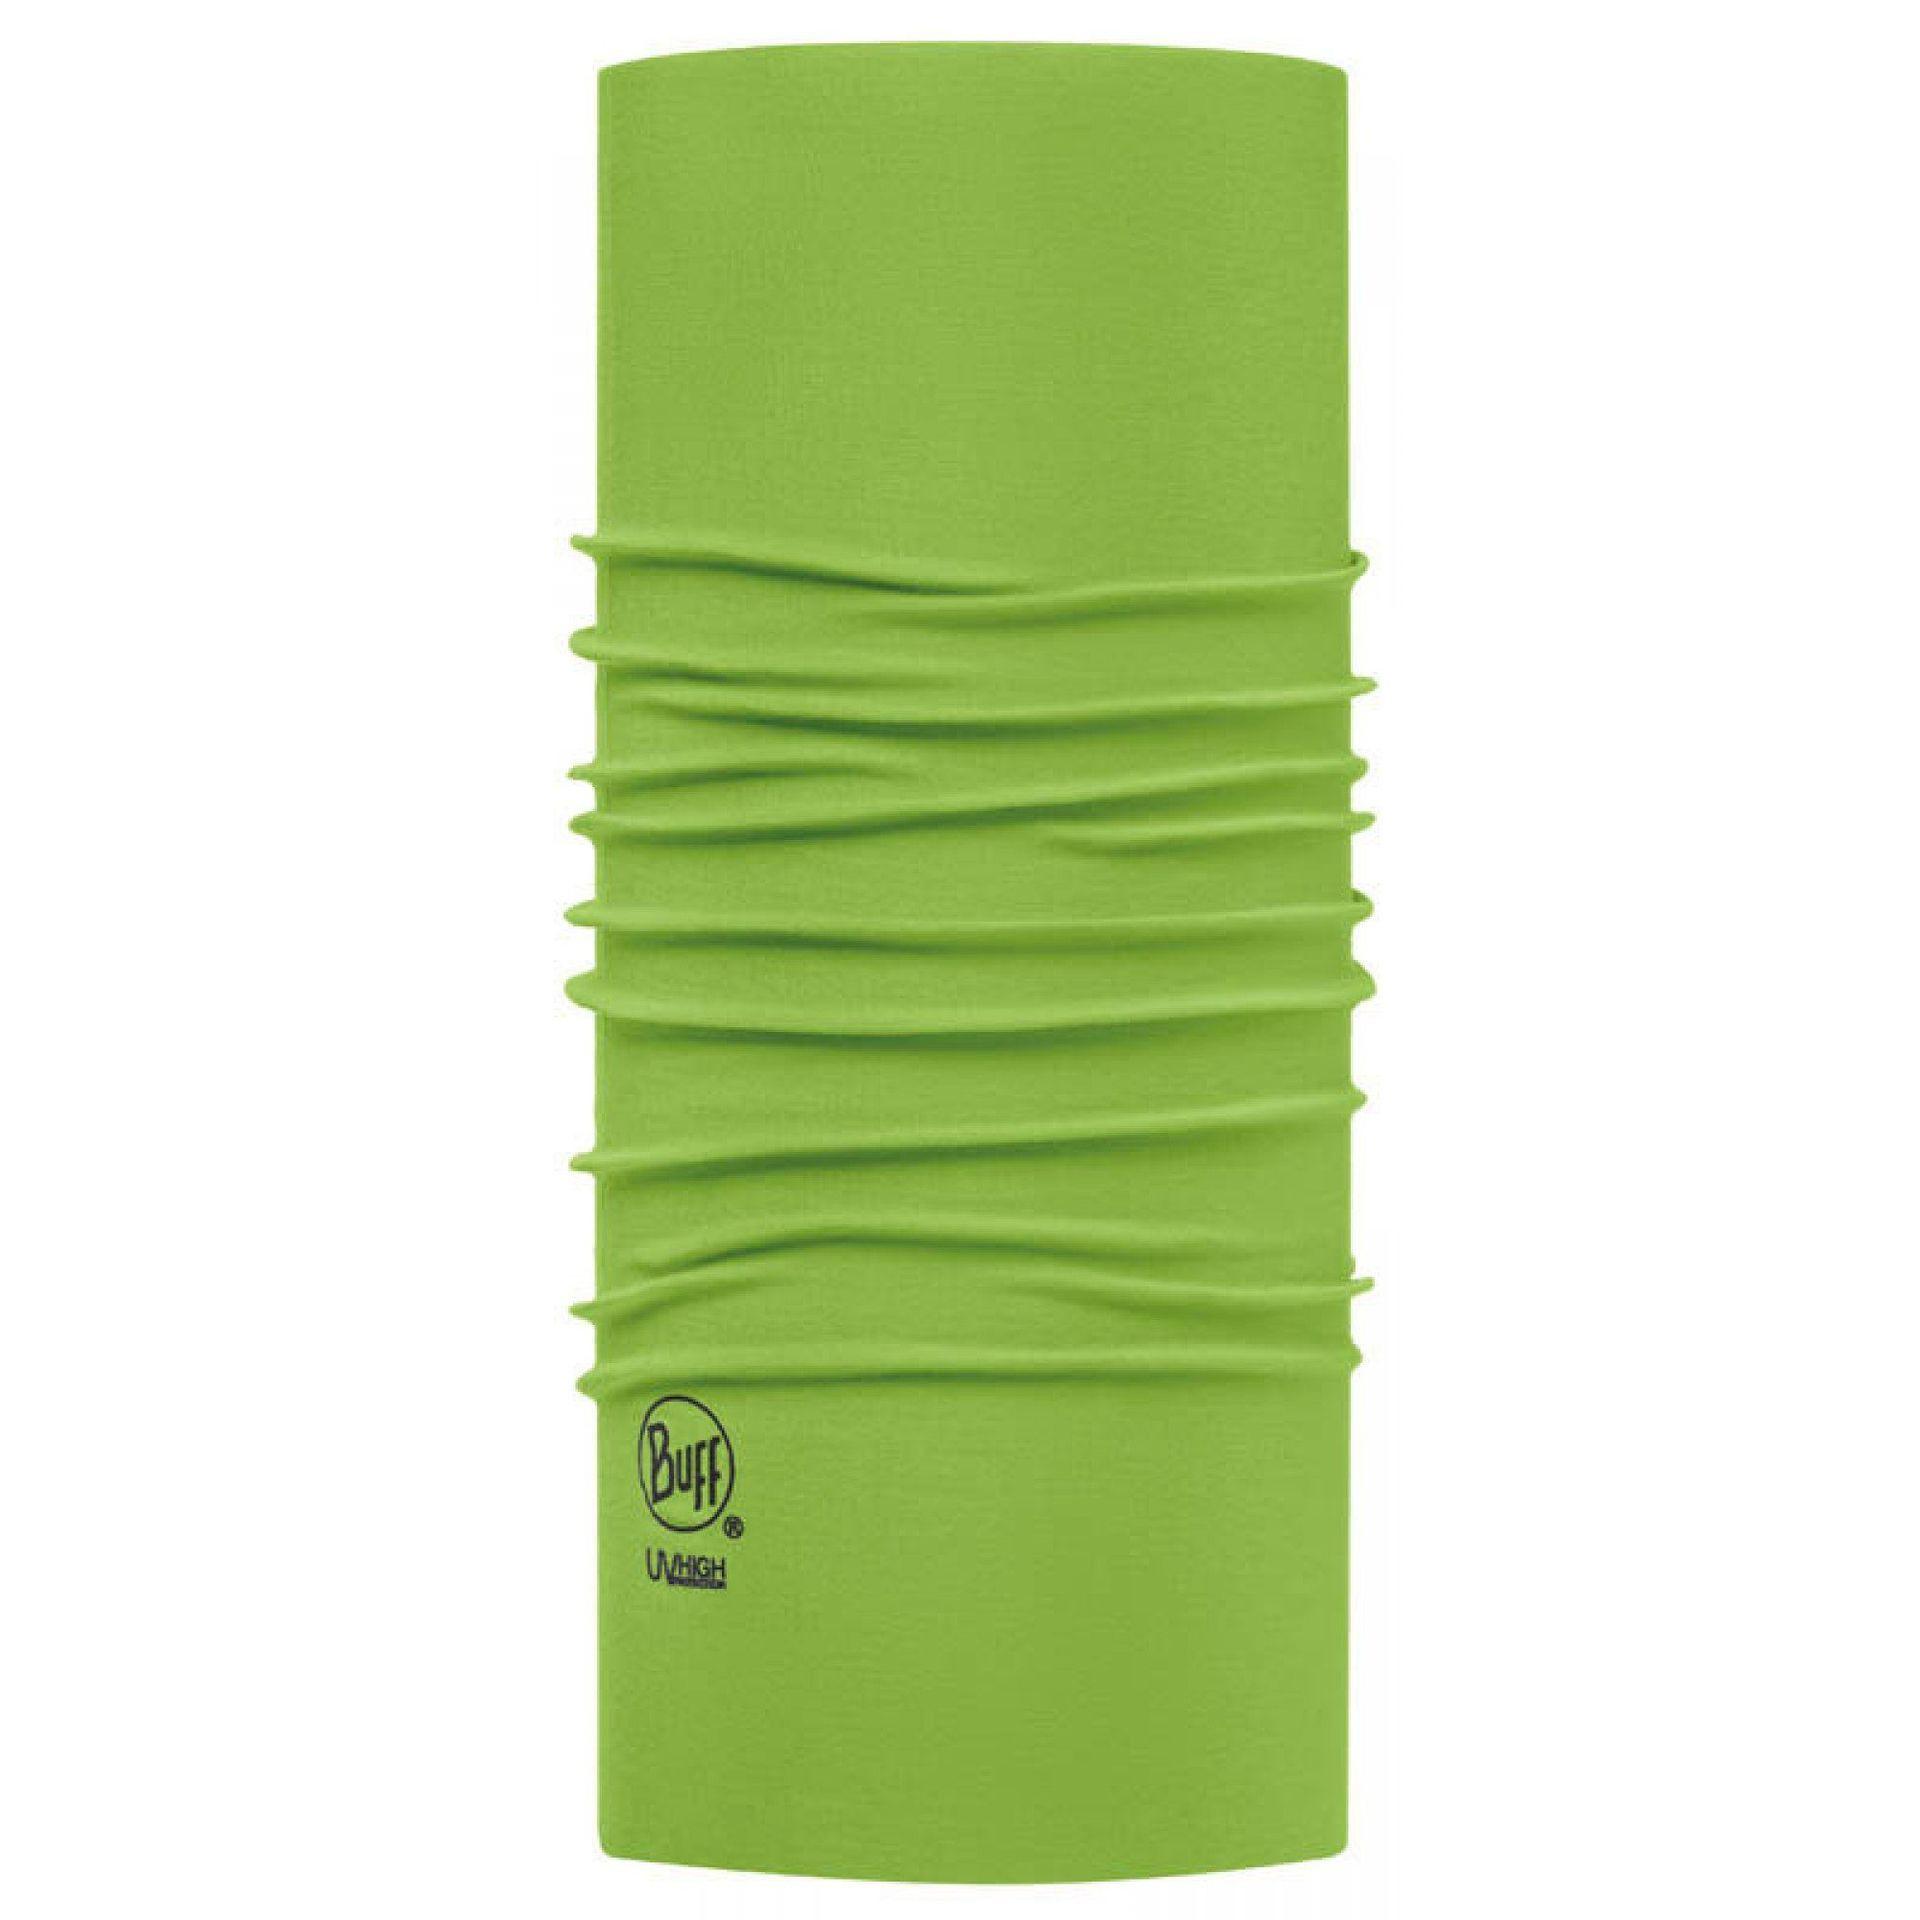 CHUSTA BUFF HIGH UV PROTECTION SOLID GREENERY